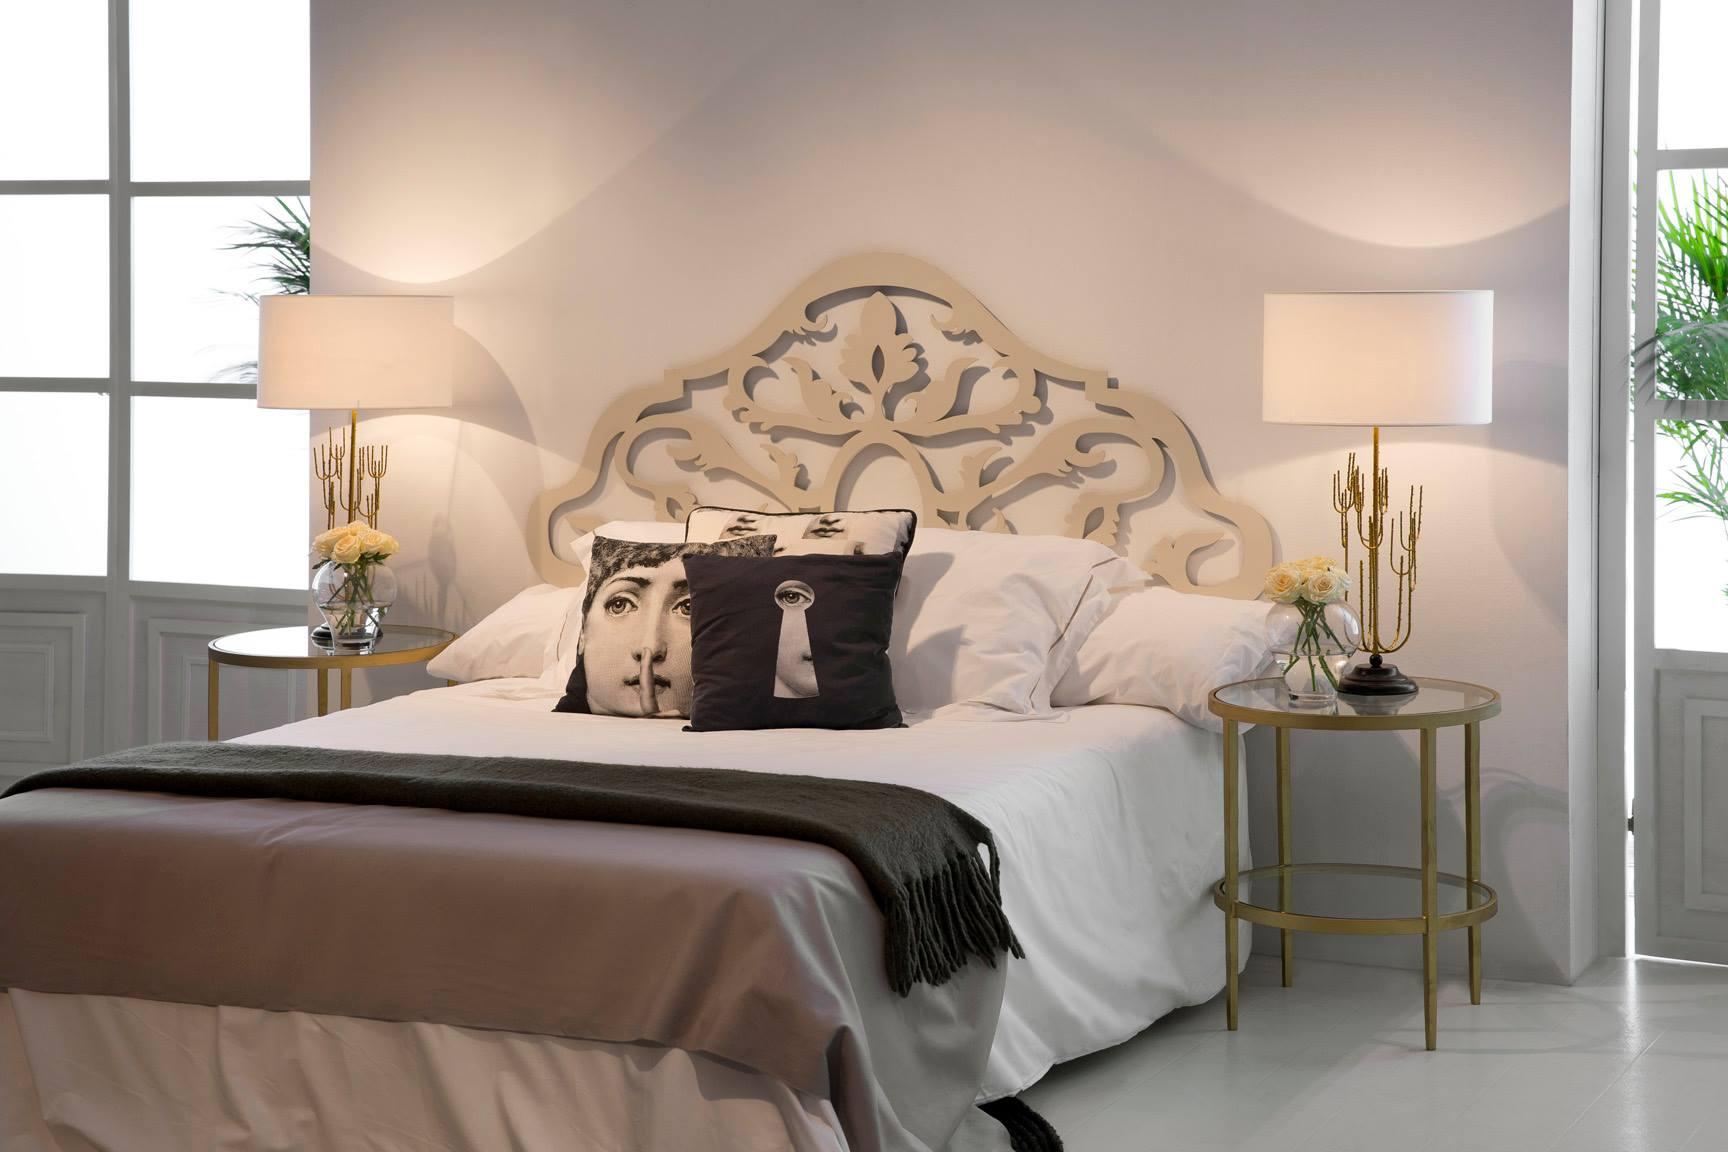 Muebles bidasoa en irun vende dormitorios de matrimonio for Muebles auxiliares dormitorio matrimonio